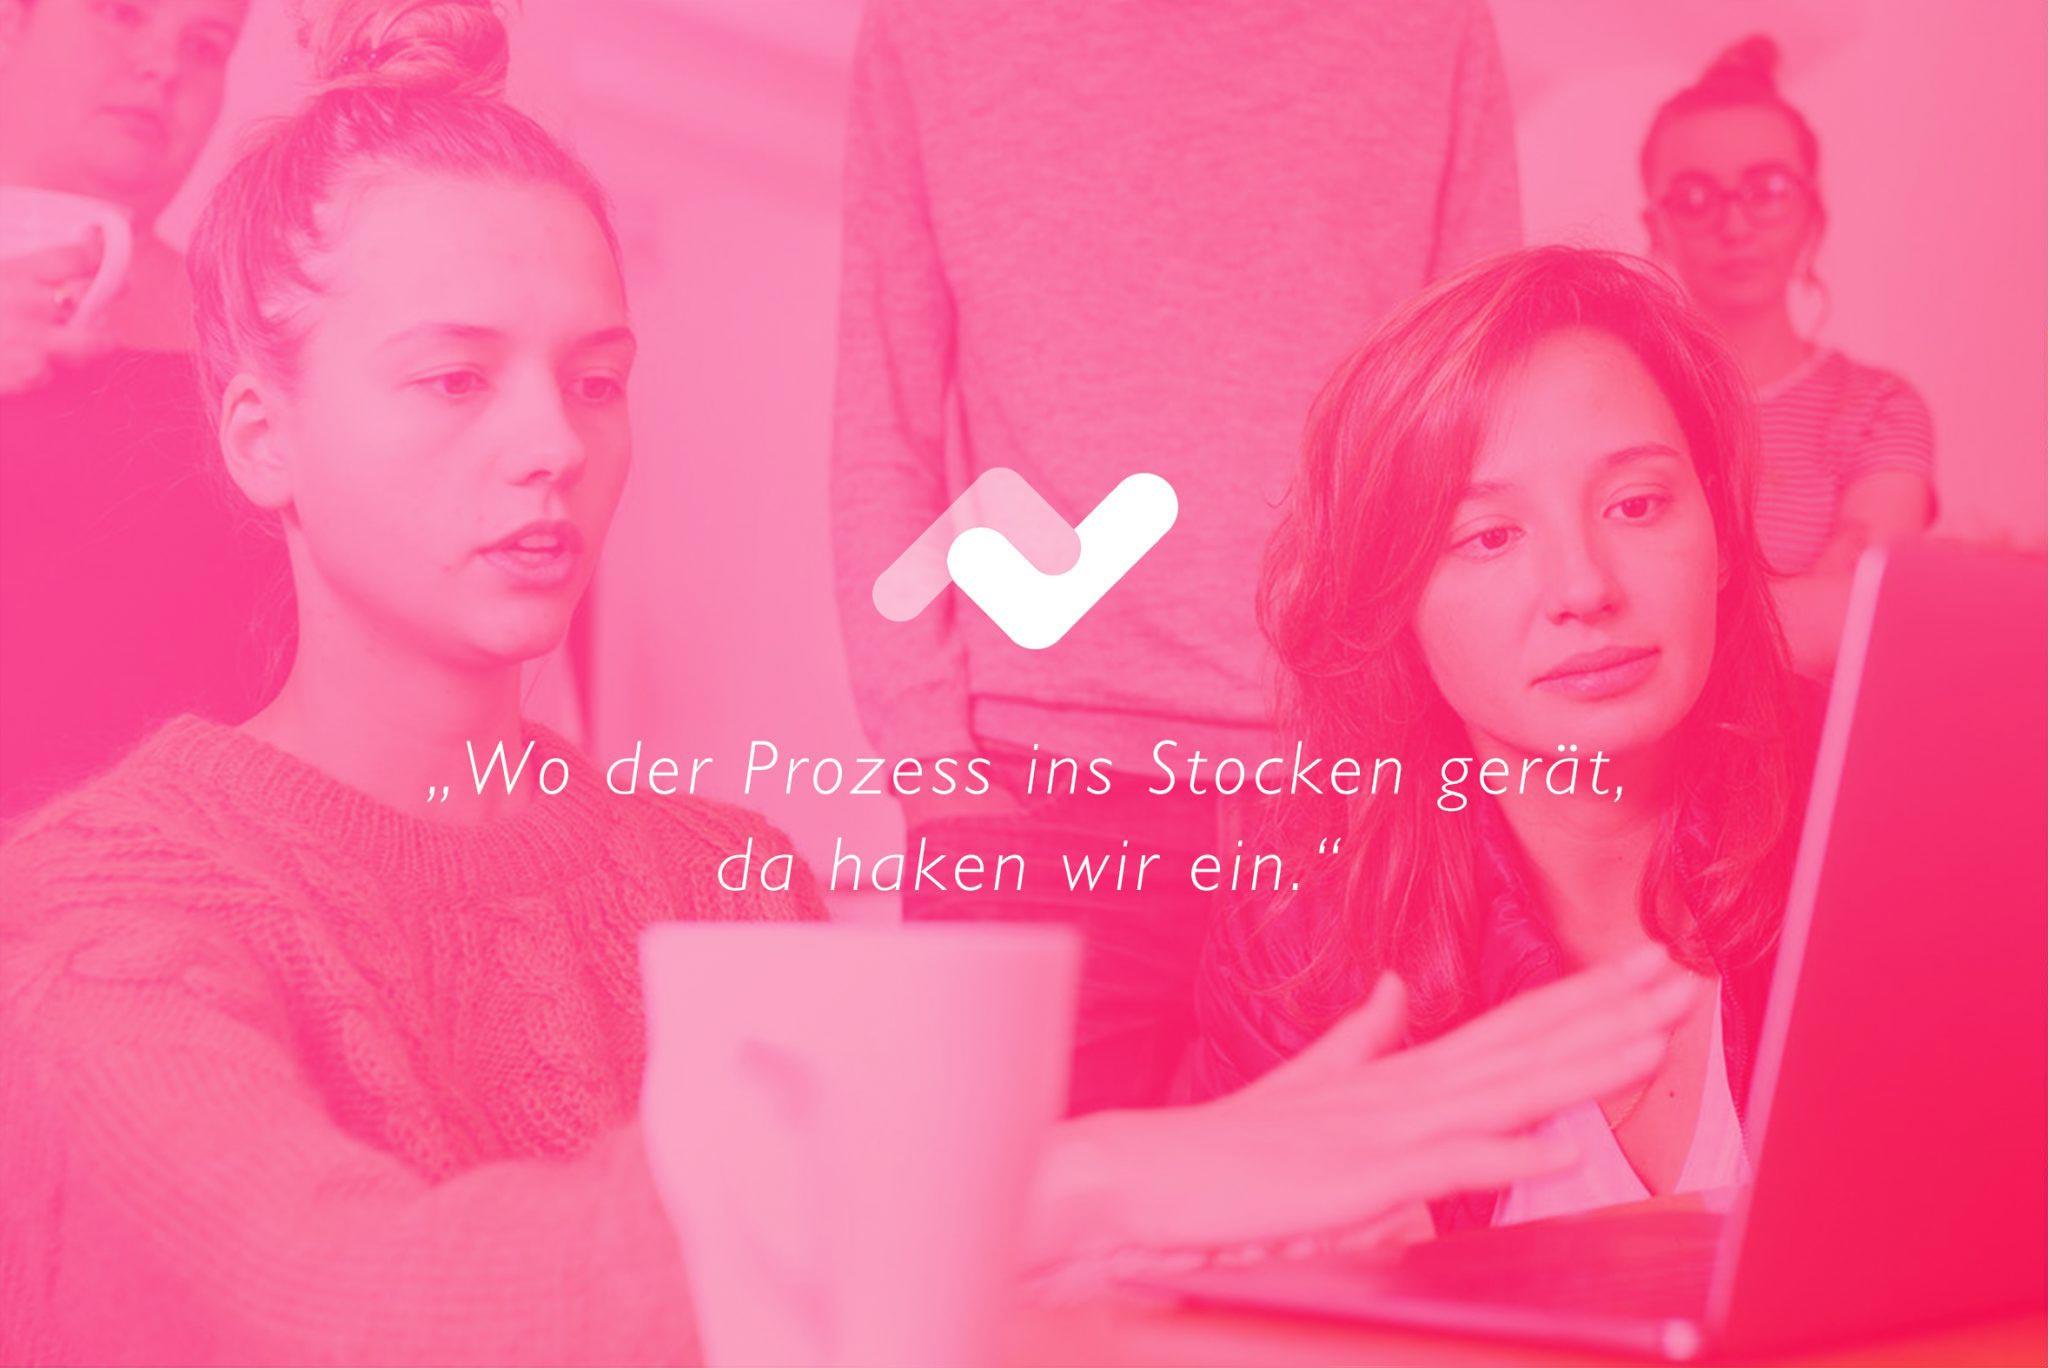 Coaching, Grafik Design, Gestaltung, Visitenkarten, Webdesign in Bad Segeberg und Umgebung